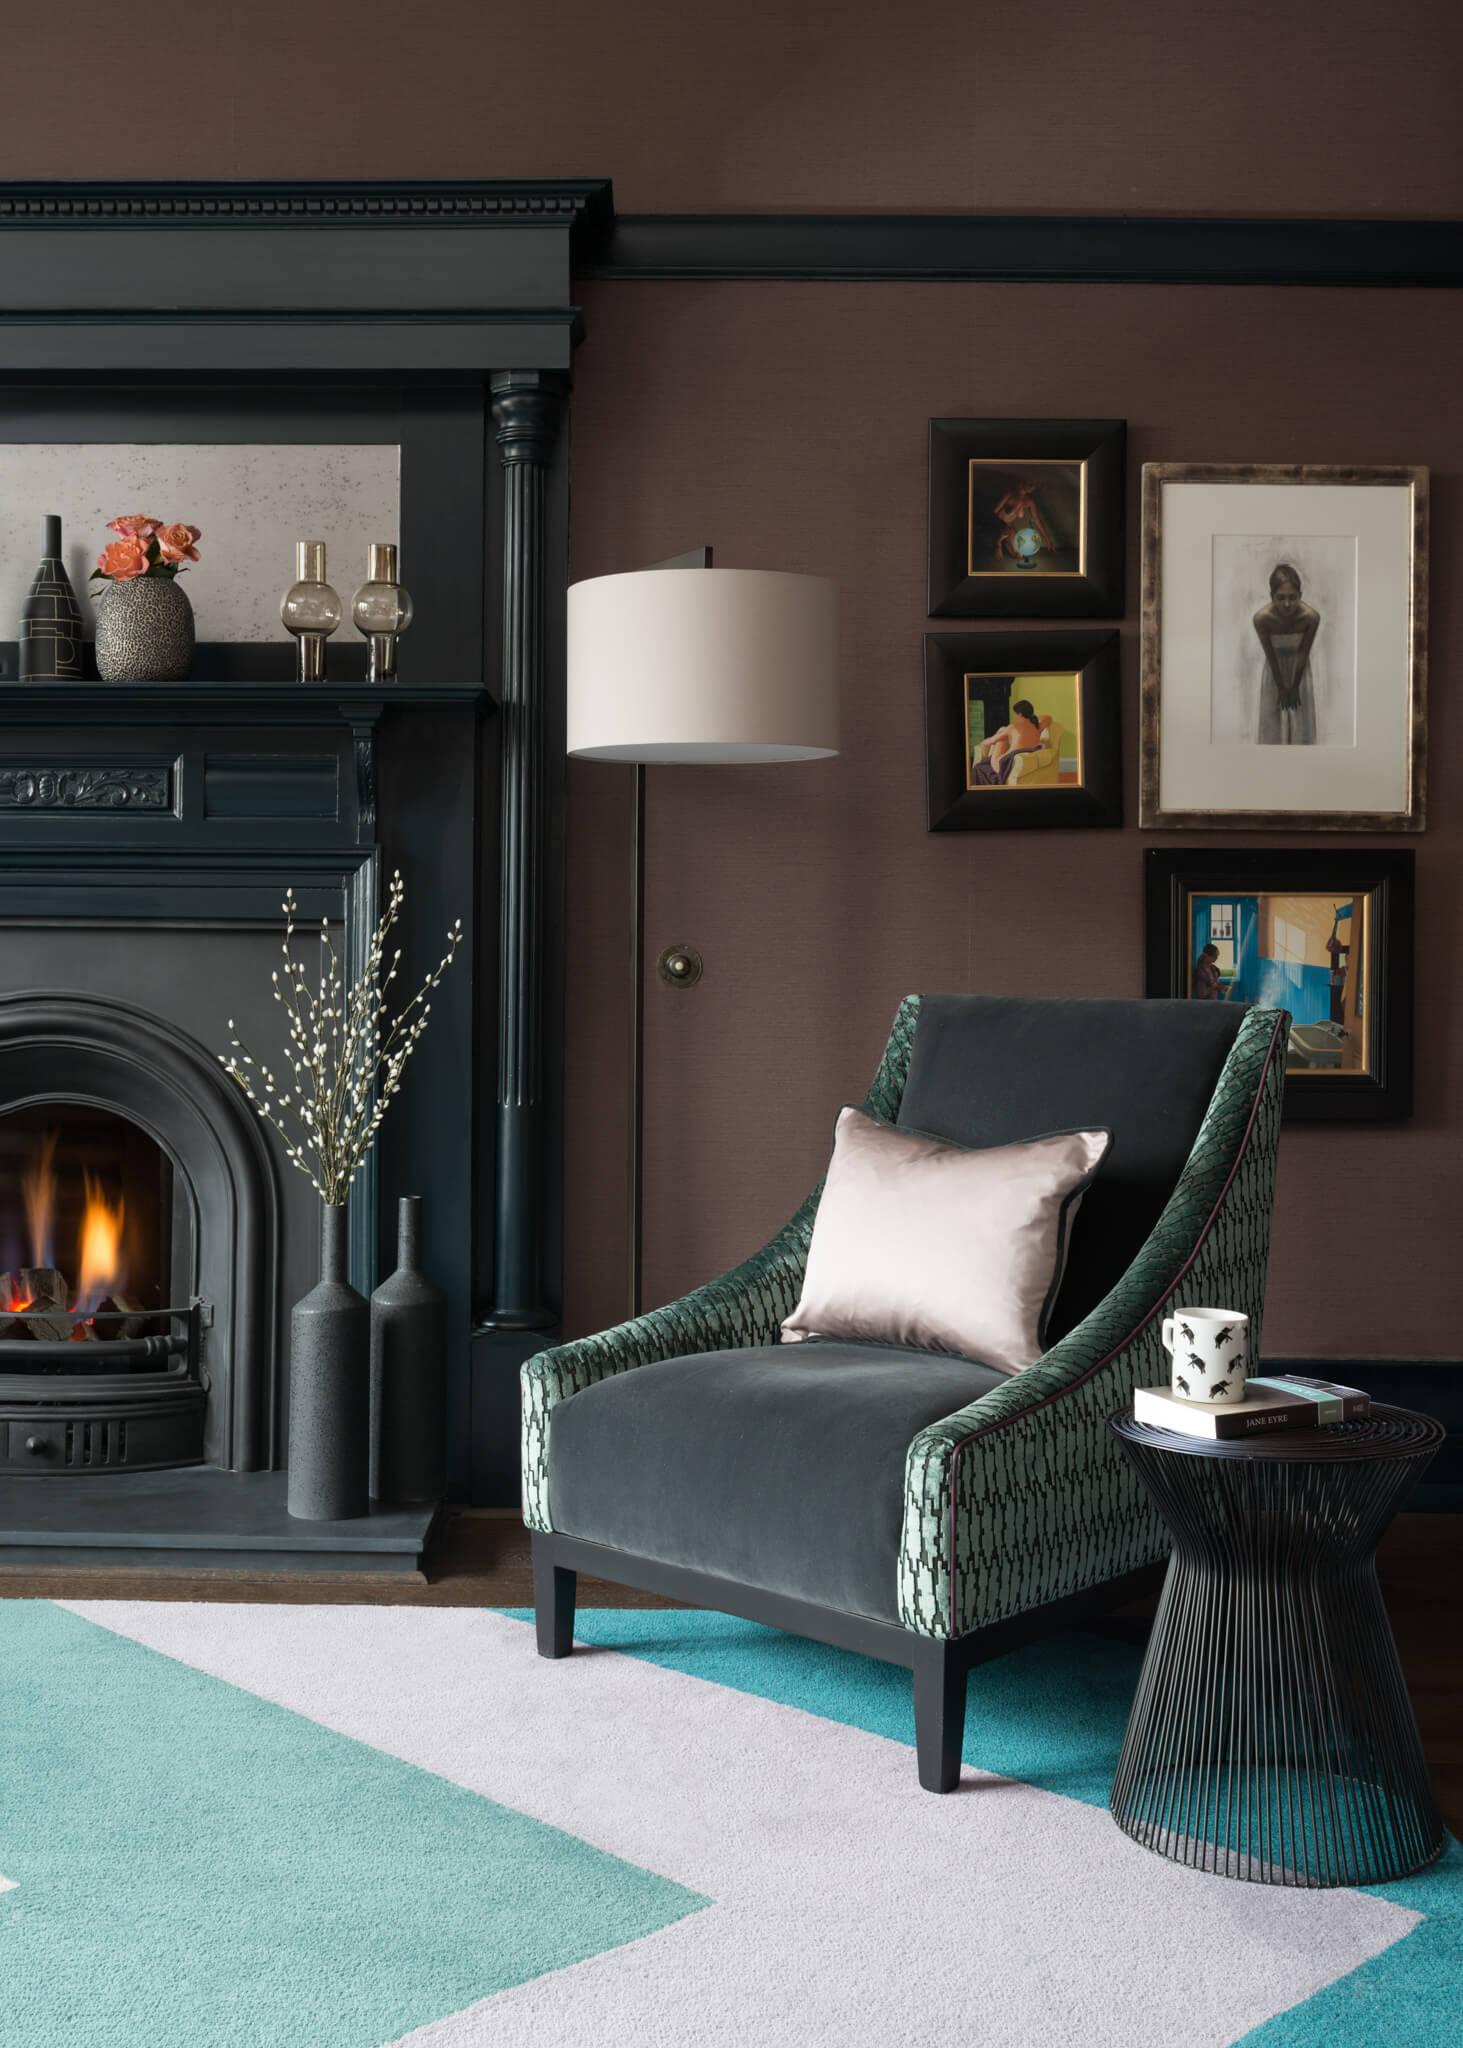 Print-Livingroom-and-Armchair-Chelsea-Mclaine-Interiors-Introductory-Shoot-©ZACandZAC